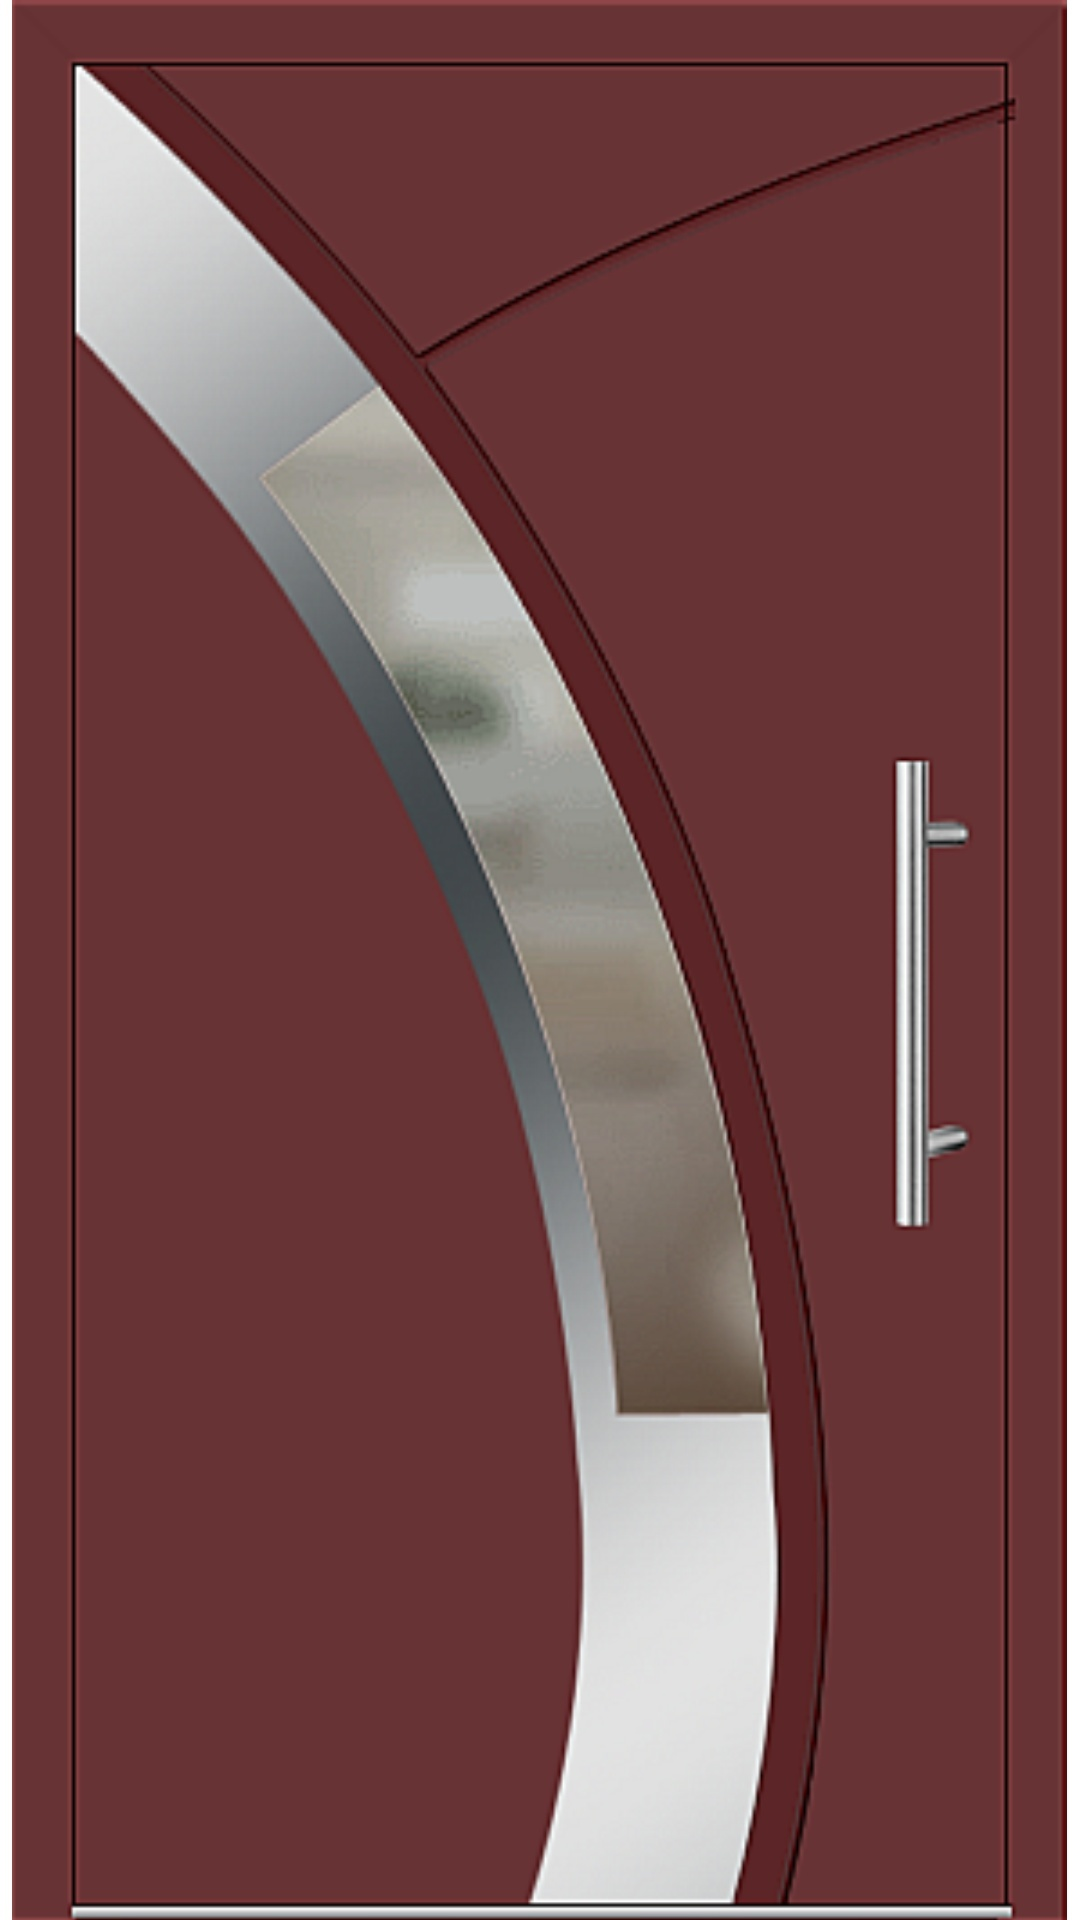 Aluminium Haustür Modell 6438-57 braunrot